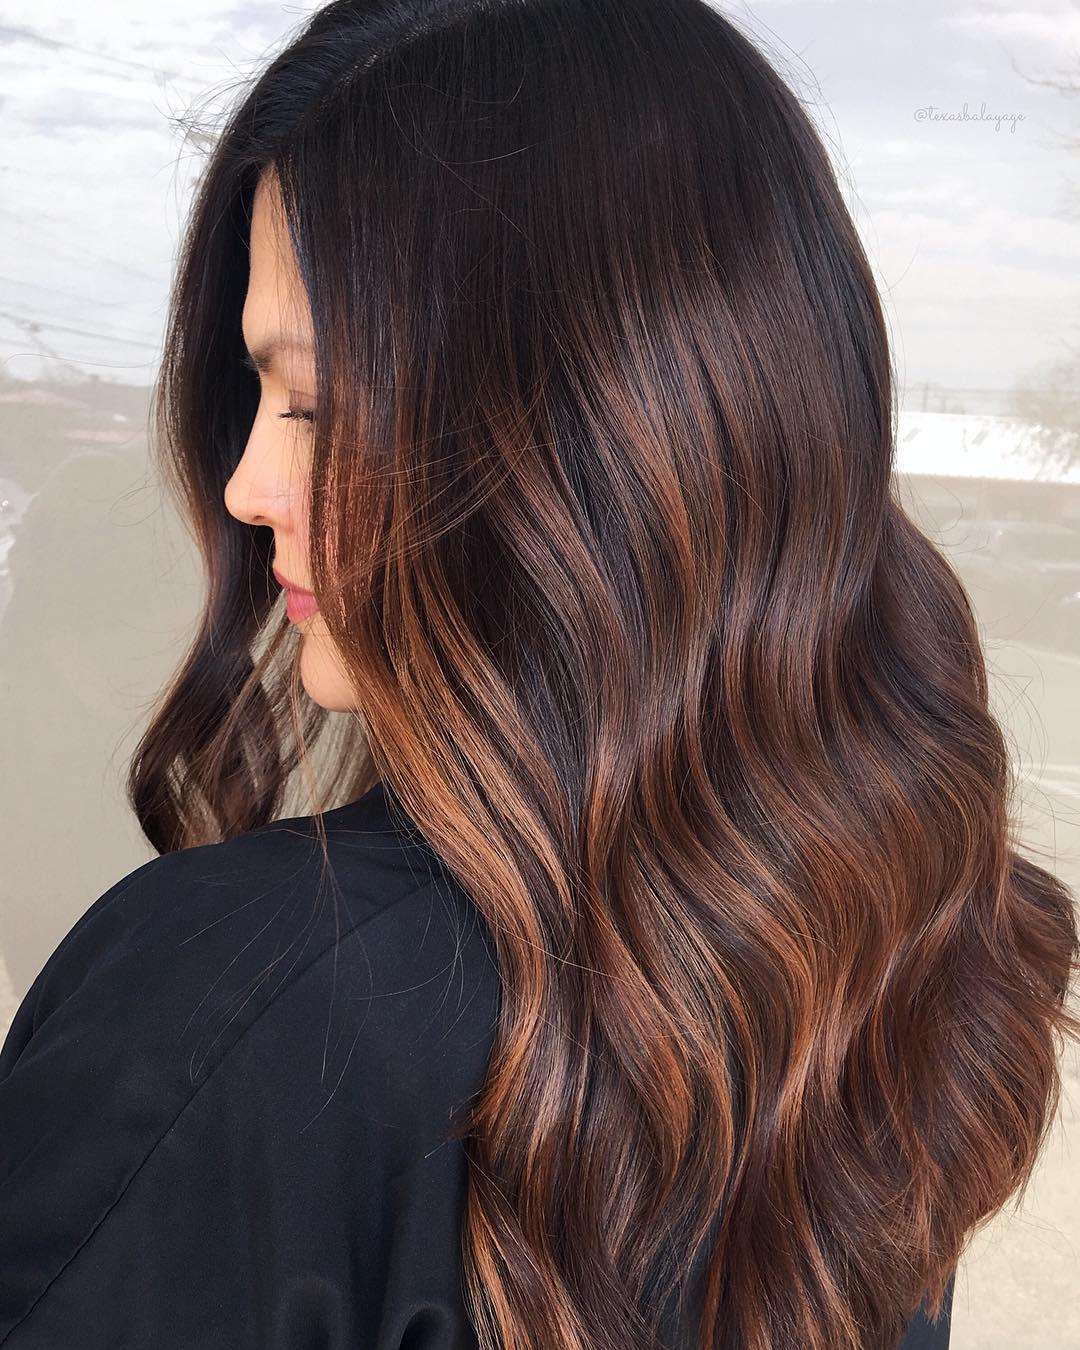 Caramel Highlights for Maple Brown Hair